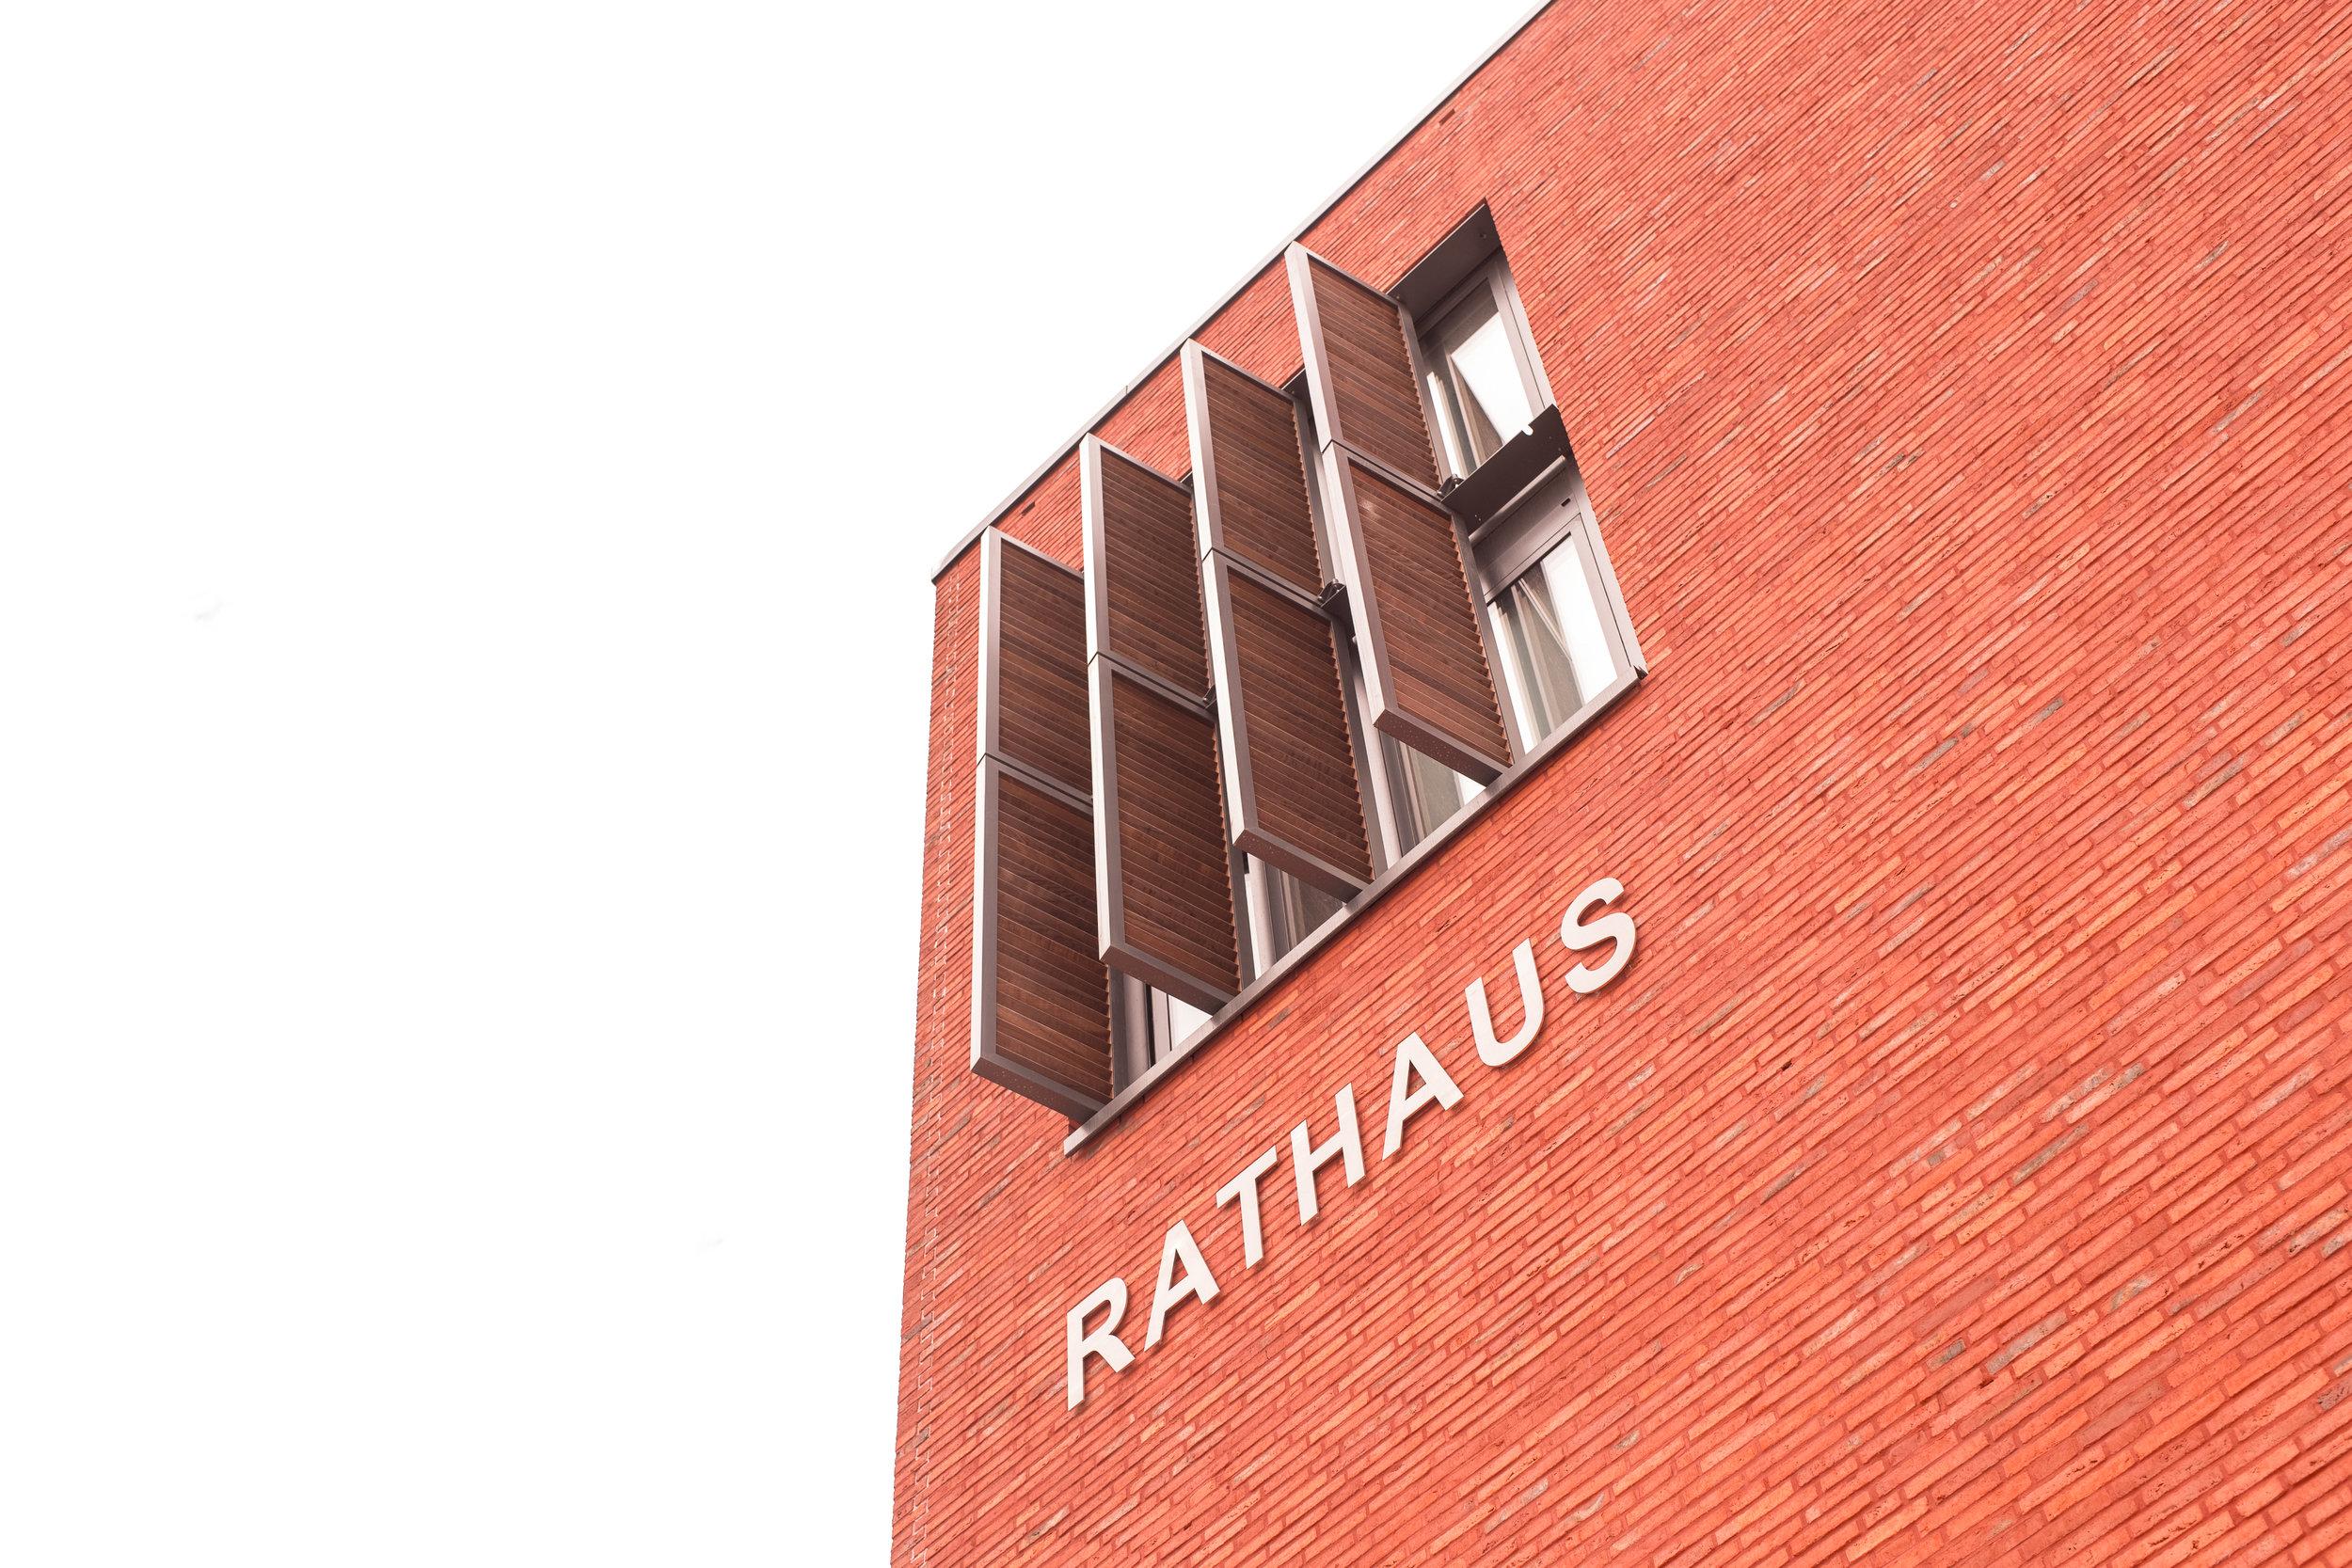 2016-05-31_Stahlbau-Naegele_Rathaus-Eislingen_0550.jpg